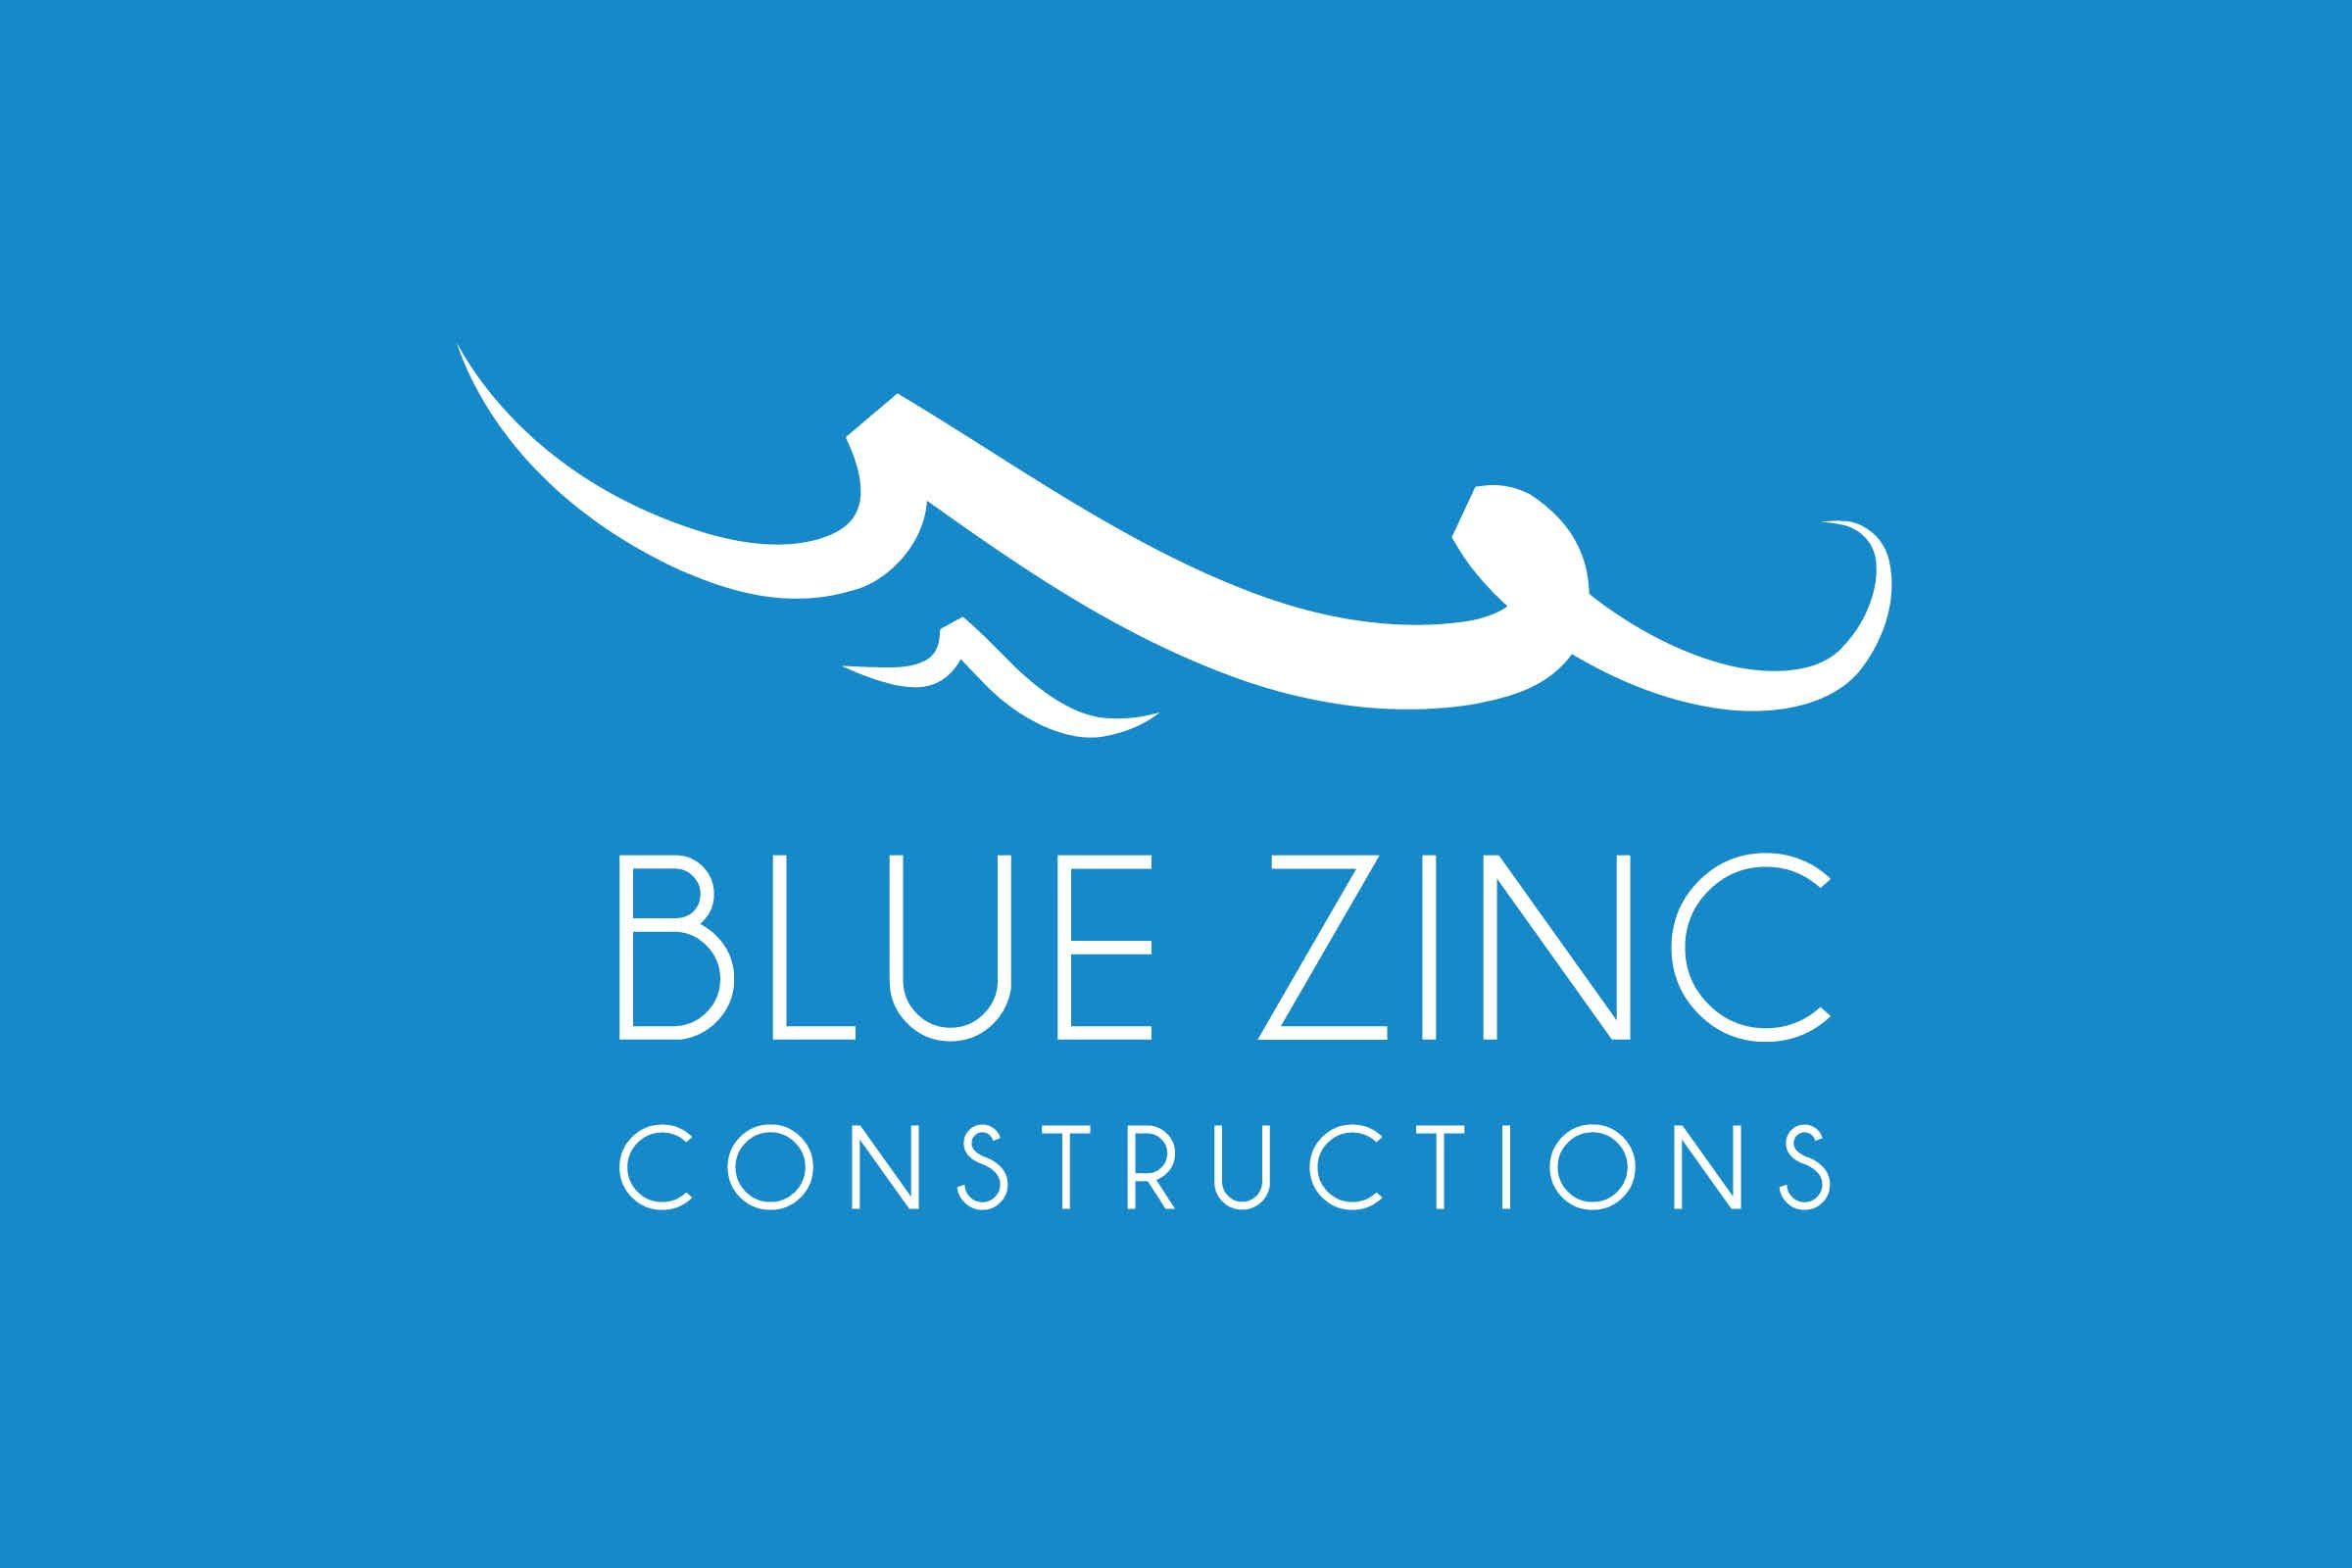 Yik Yak Creative | Blue Zinc Constructions | Construction Company Logo Design | Sydney Web Designer | North Shore Graphic Designer | Hornsby | Building Logo | SEO Website